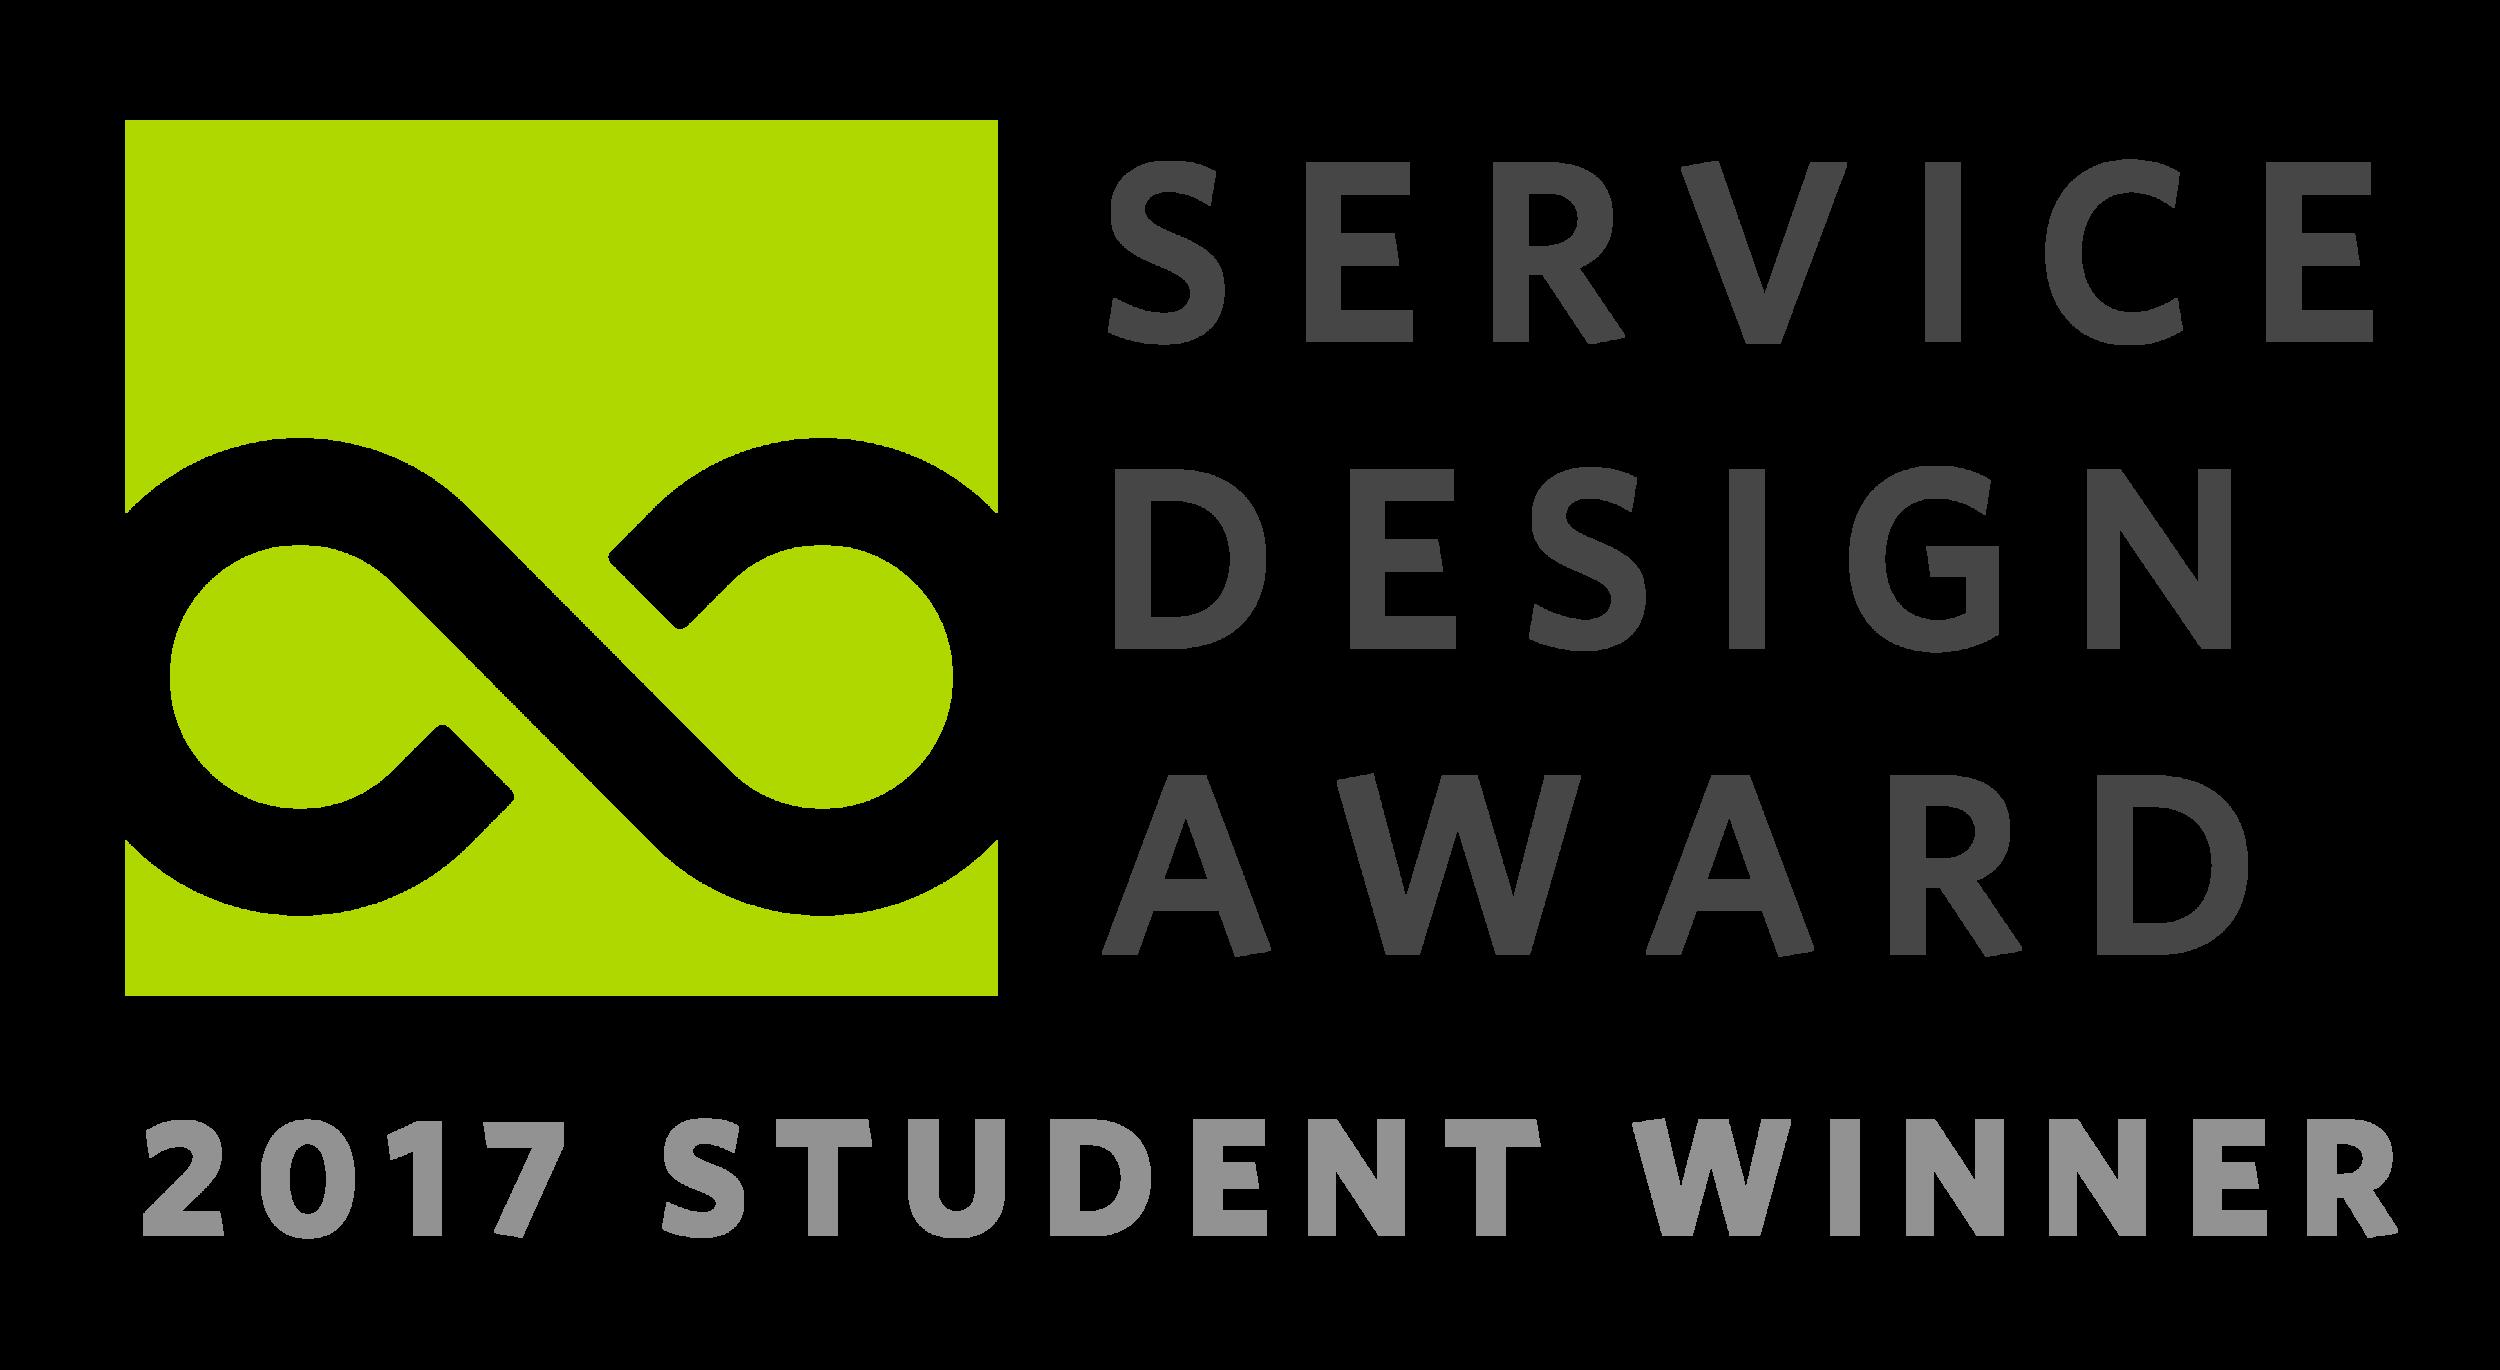 2017 STUDENT WINNER_RGB_Digital Badge-01.png